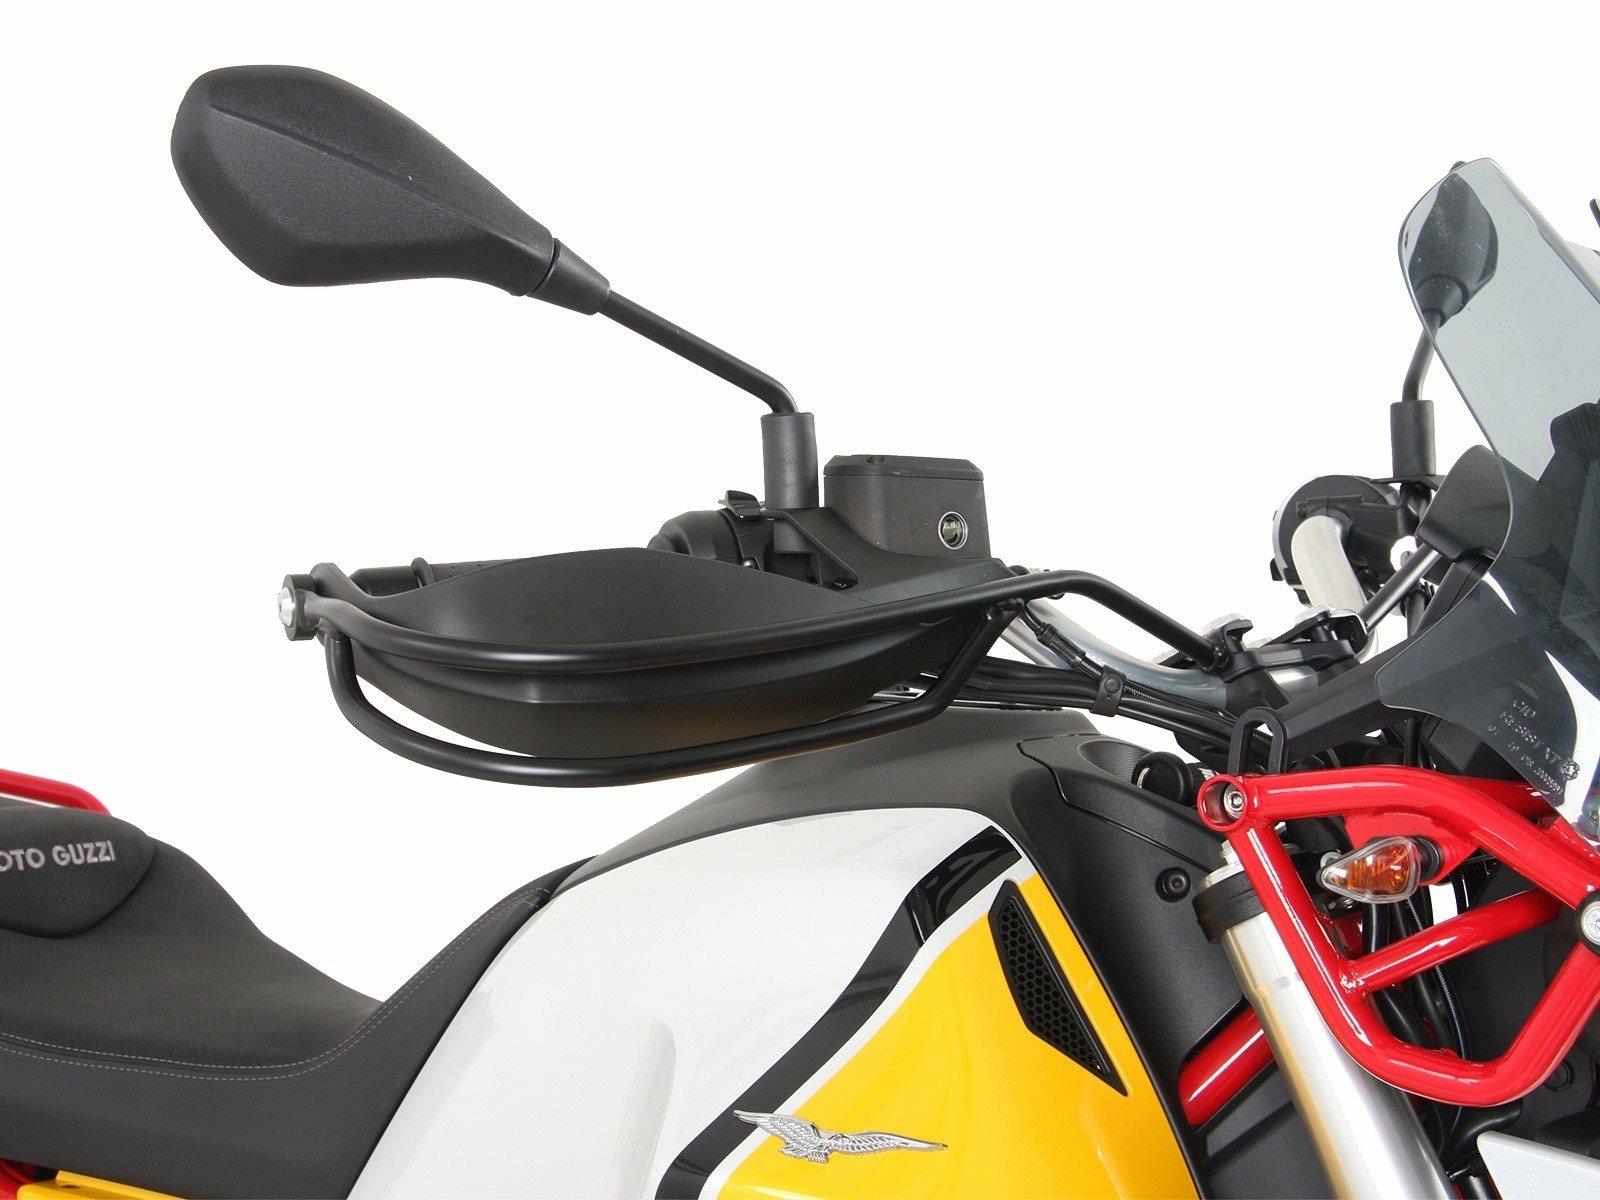 Handlebar protection - Guzzi V85